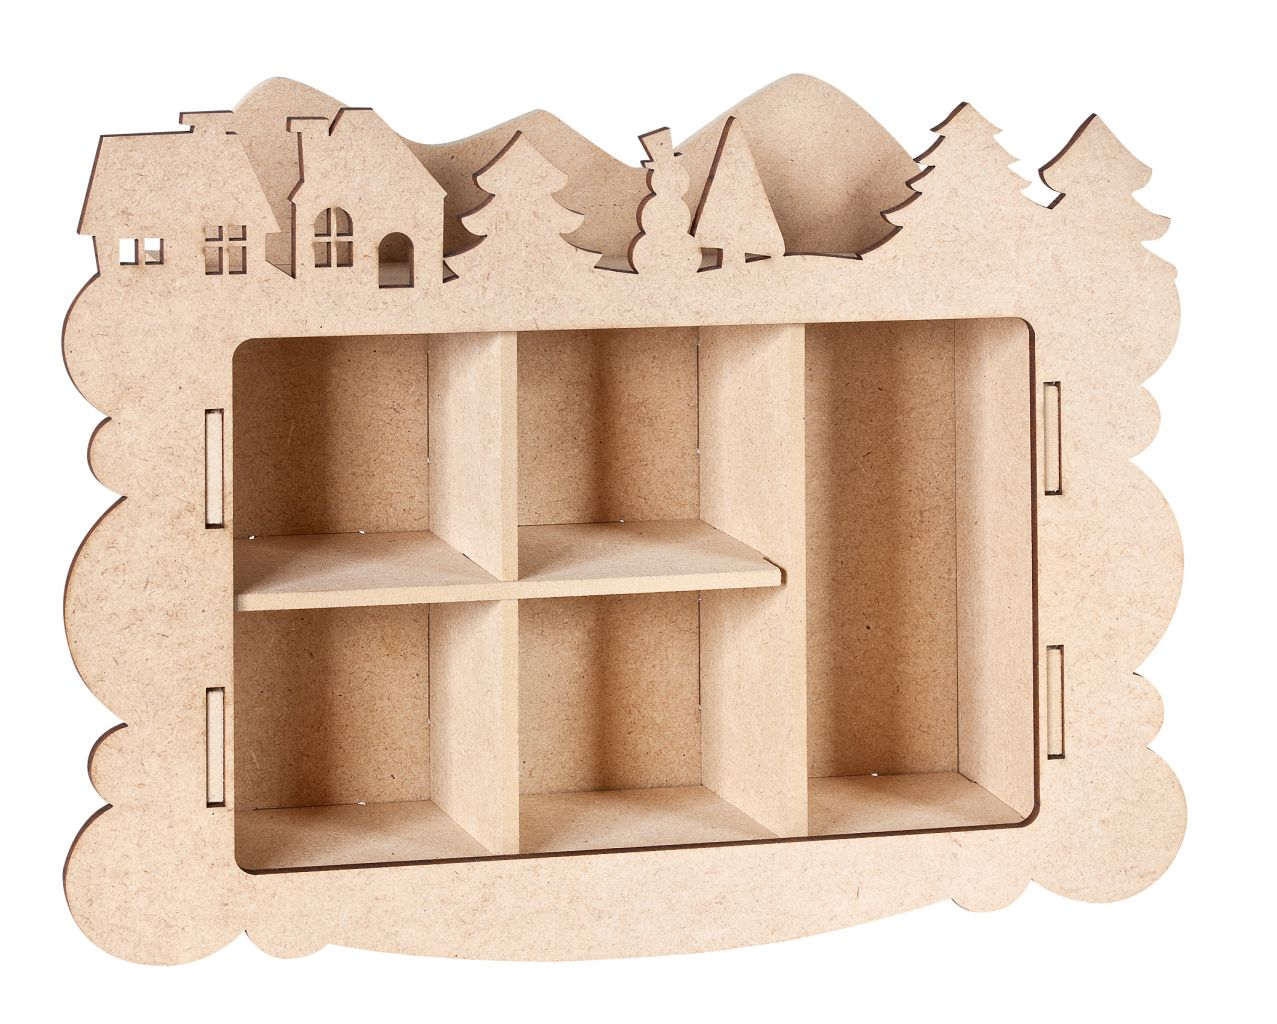 setzkasten winterdorf. Black Bedroom Furniture Sets. Home Design Ideas